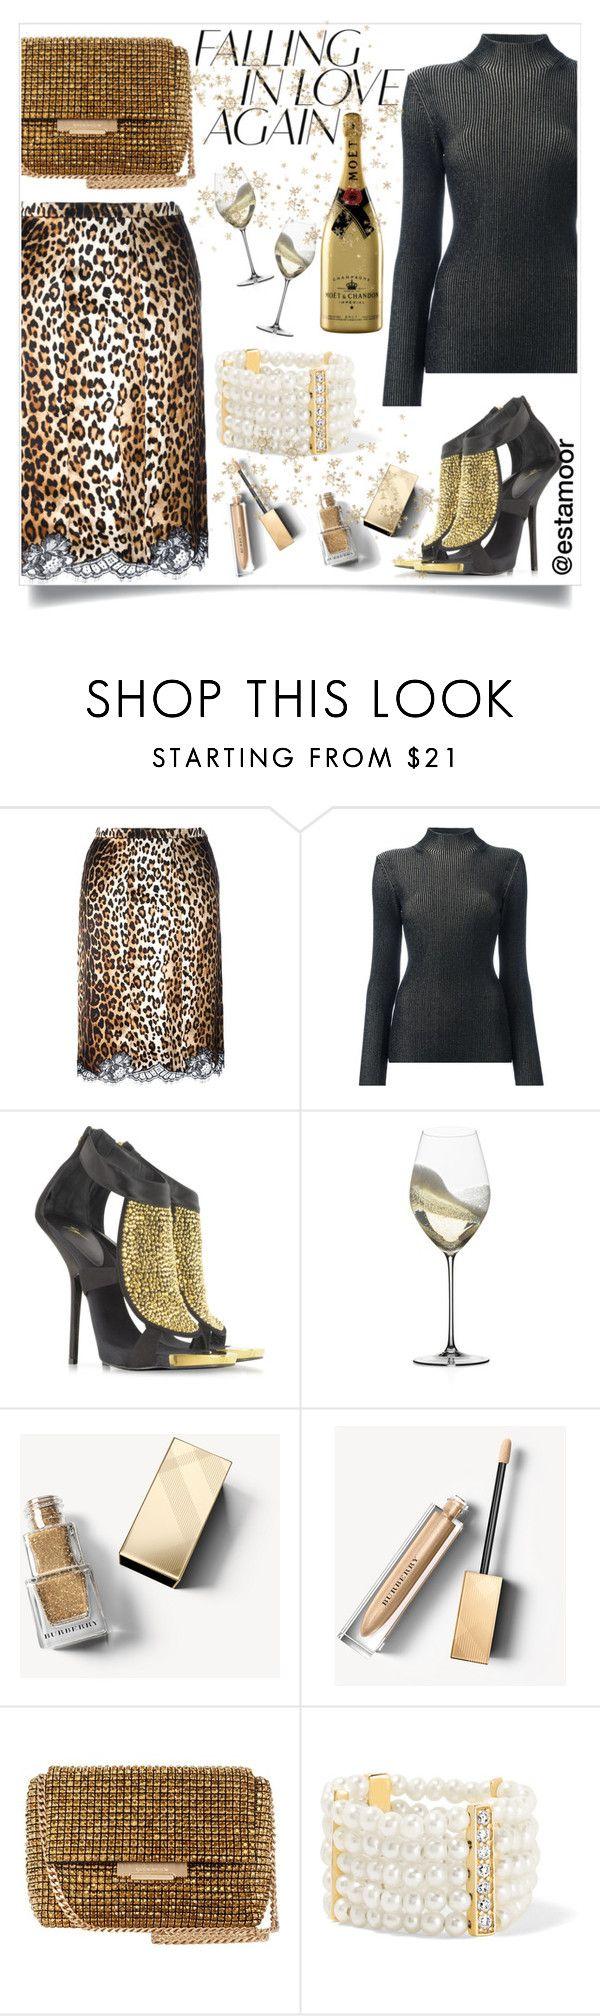 """gold"" by estamoor on Polyvore featuring мода, Givenchy, Proenza Schouler, Giuseppe Zanotti, Riedel, Burberry, Karen Millen и Anissa Kermiche"